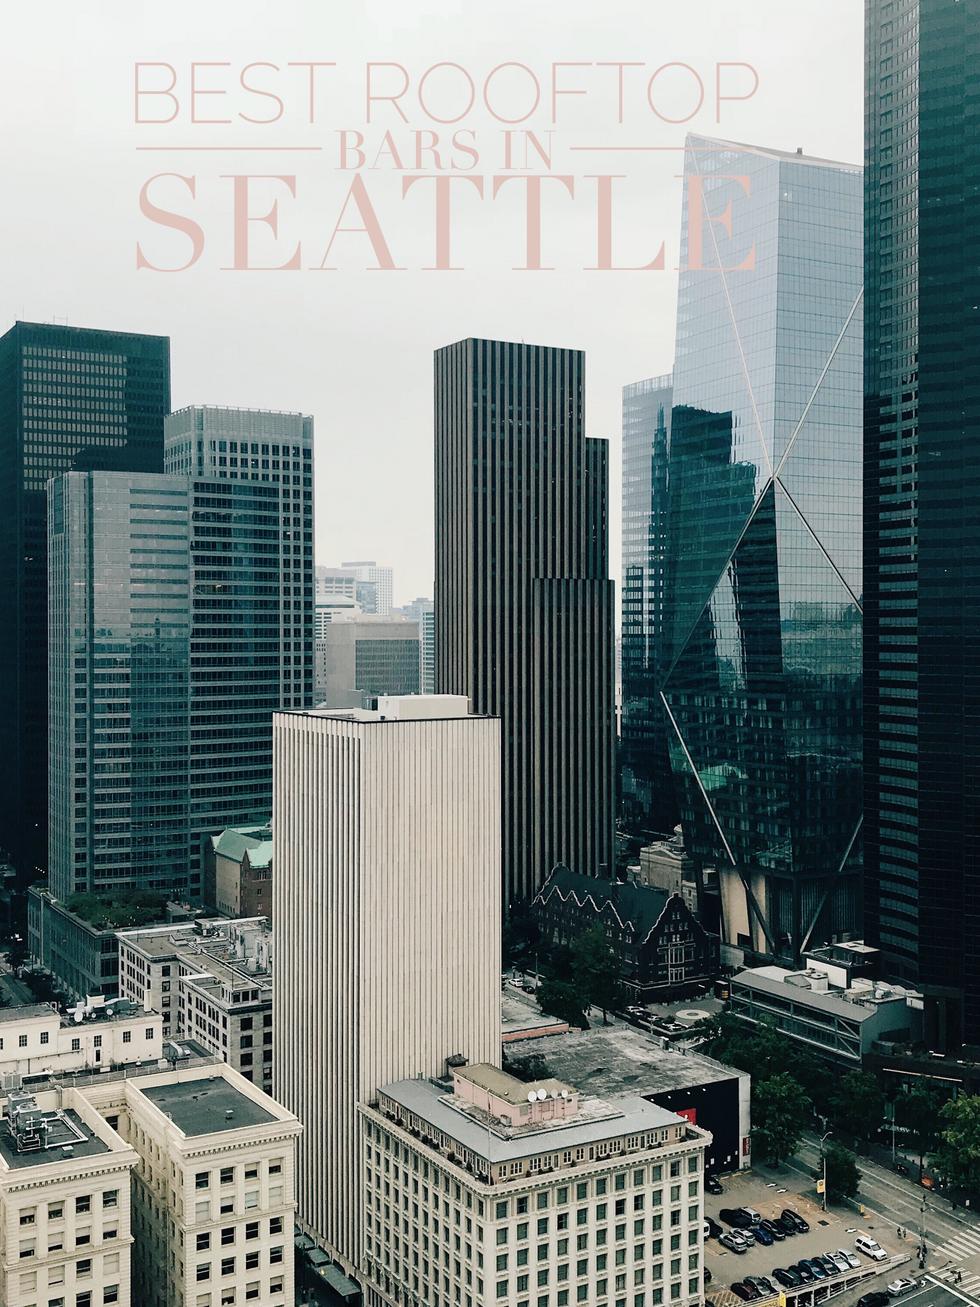 Best Rooftop Bars - Seattle, Part 1